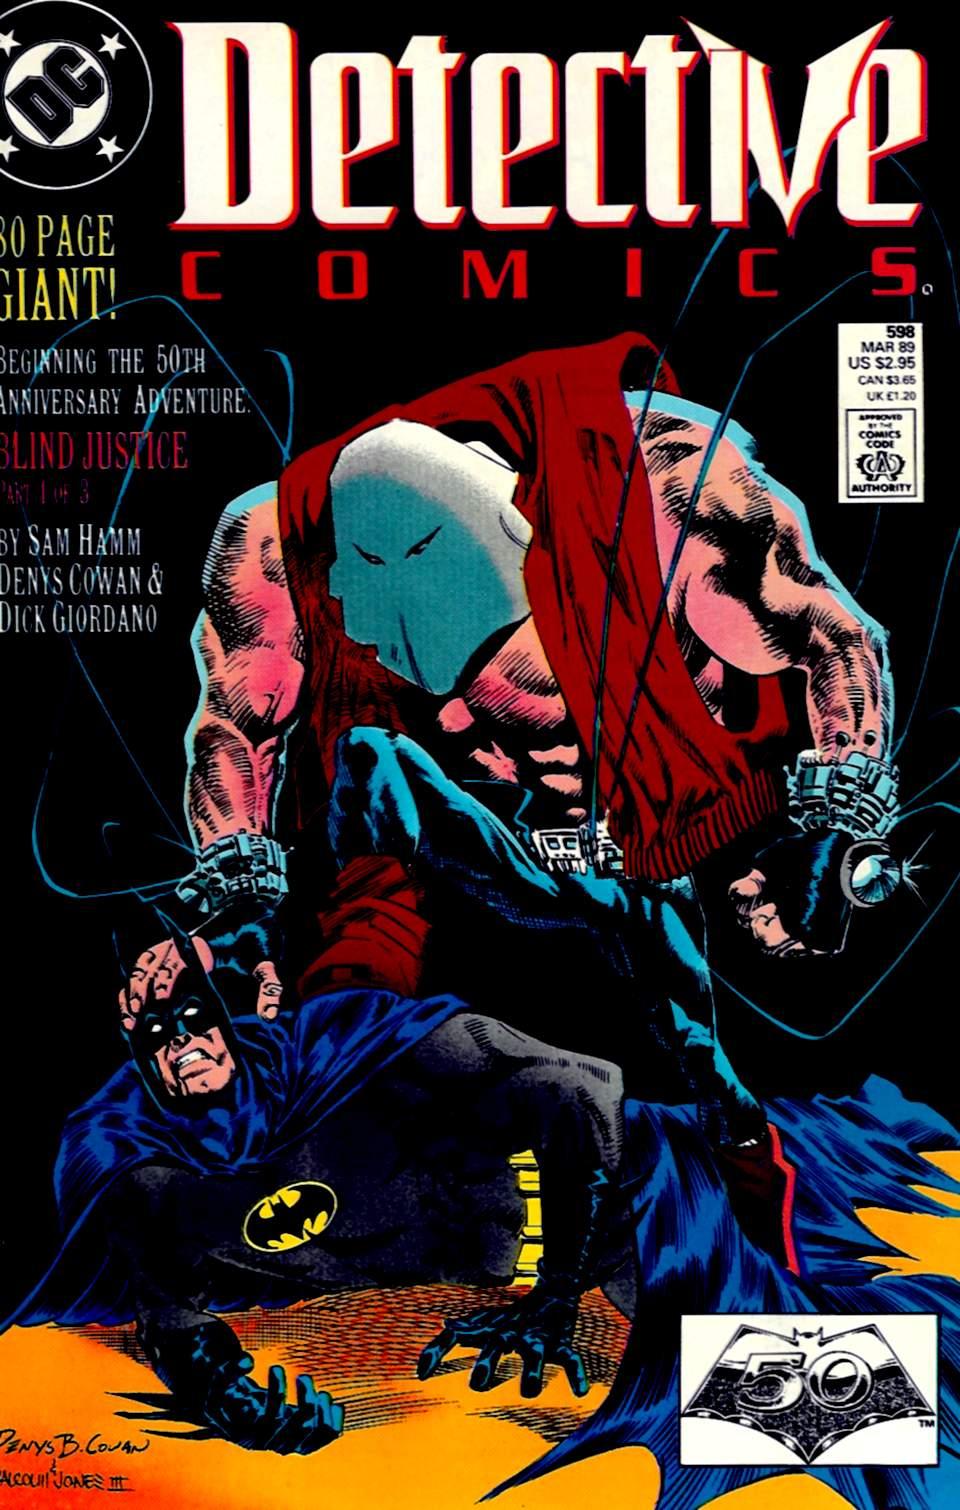 Detective Comics (1937) 598 Page 0